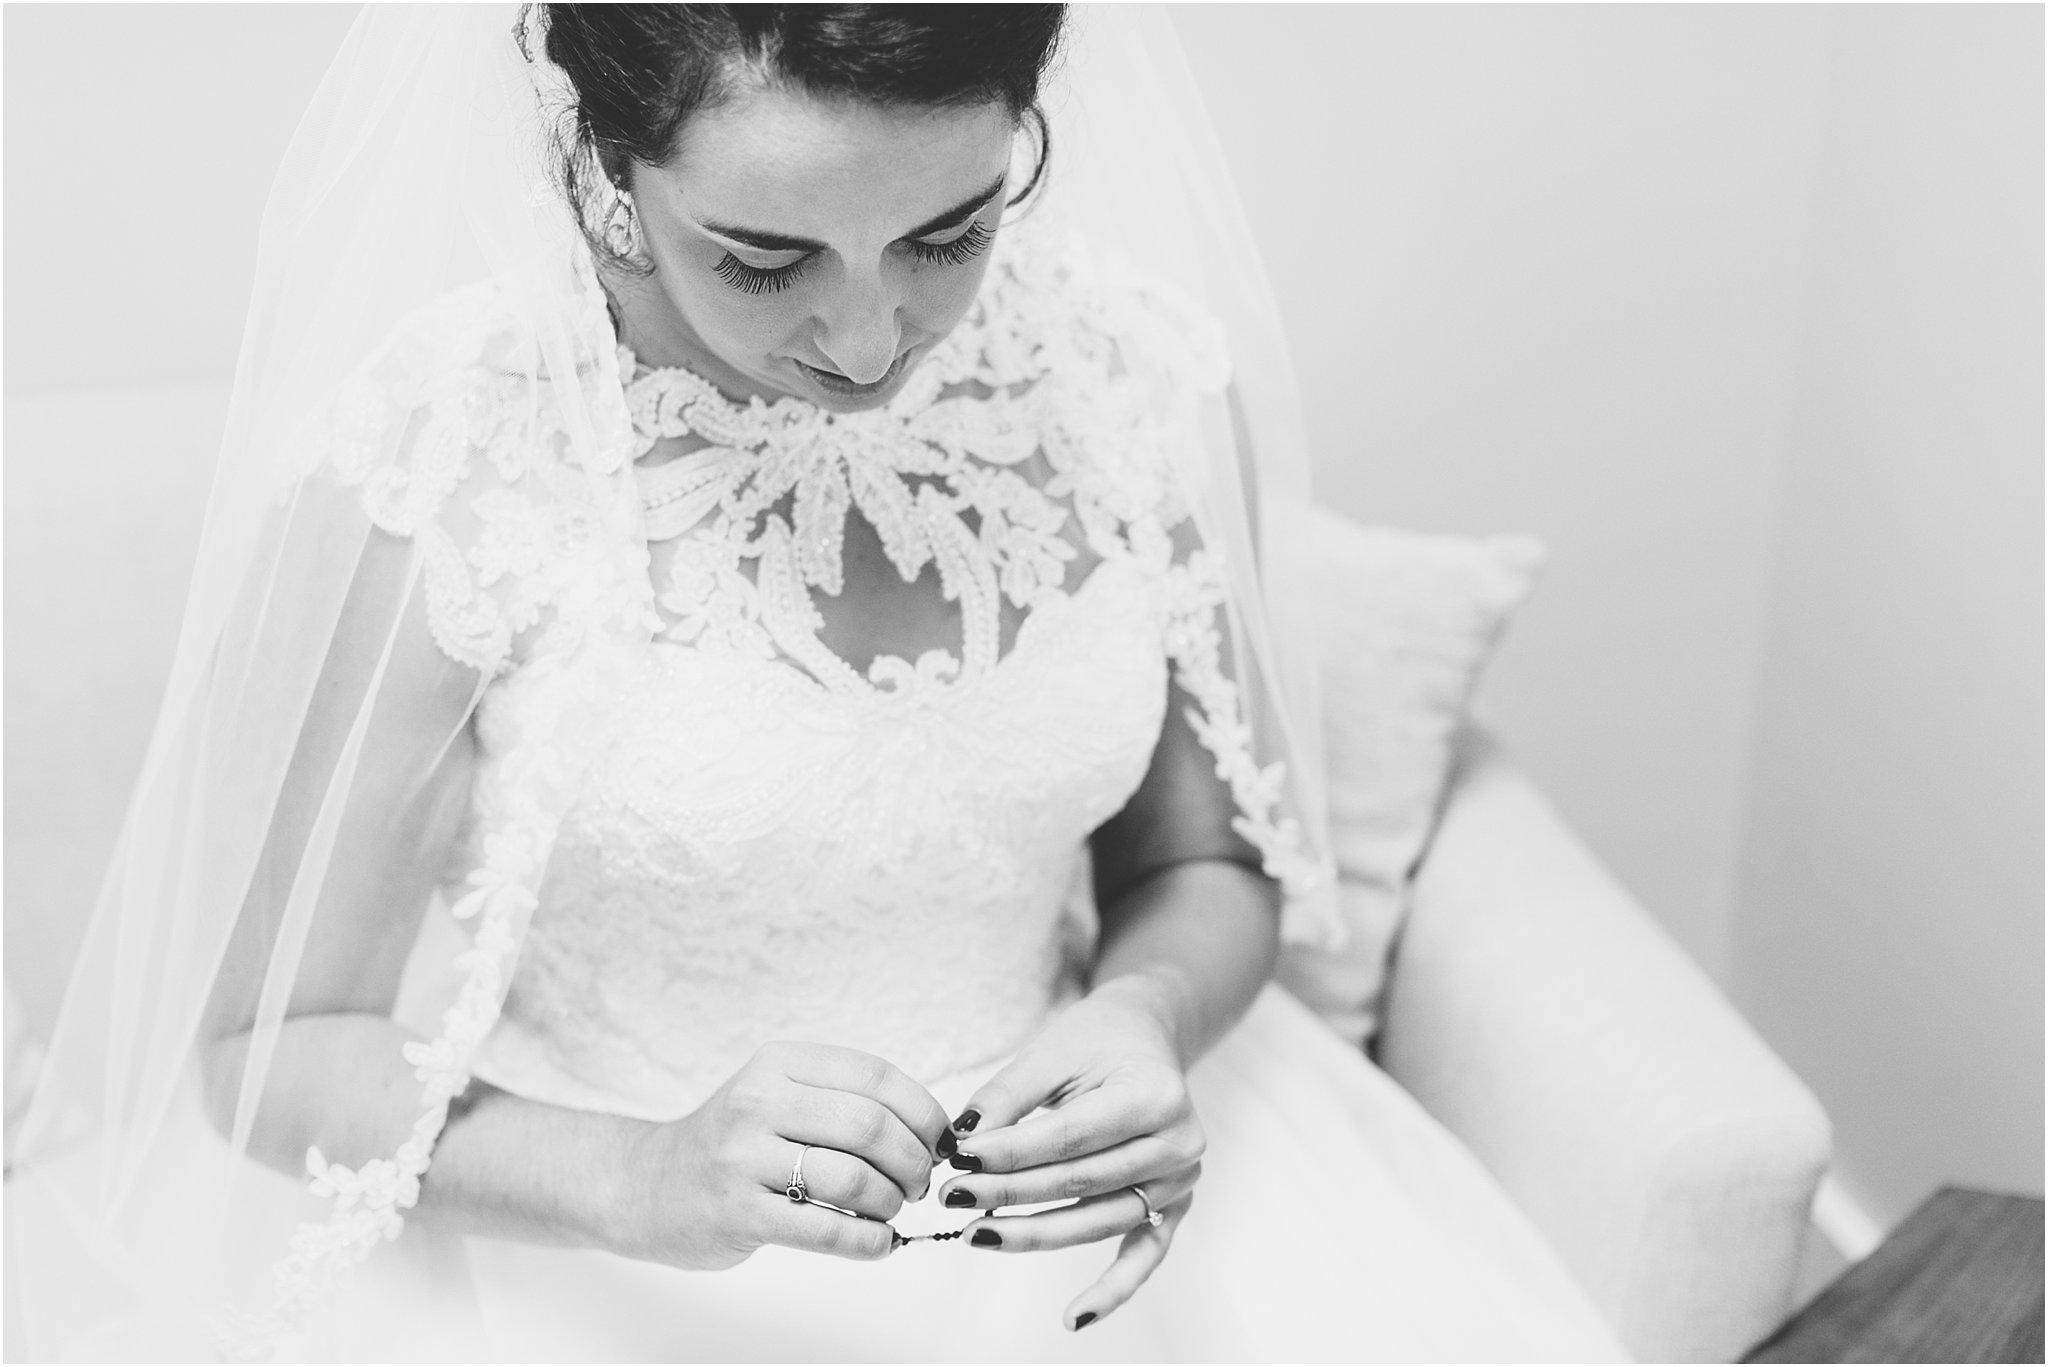 jessica_ryan_photography_virginia_wedding_photographer_wedding_hurricane_norfolk_botanical_gardens_hurricane_matthew_wedding_3558